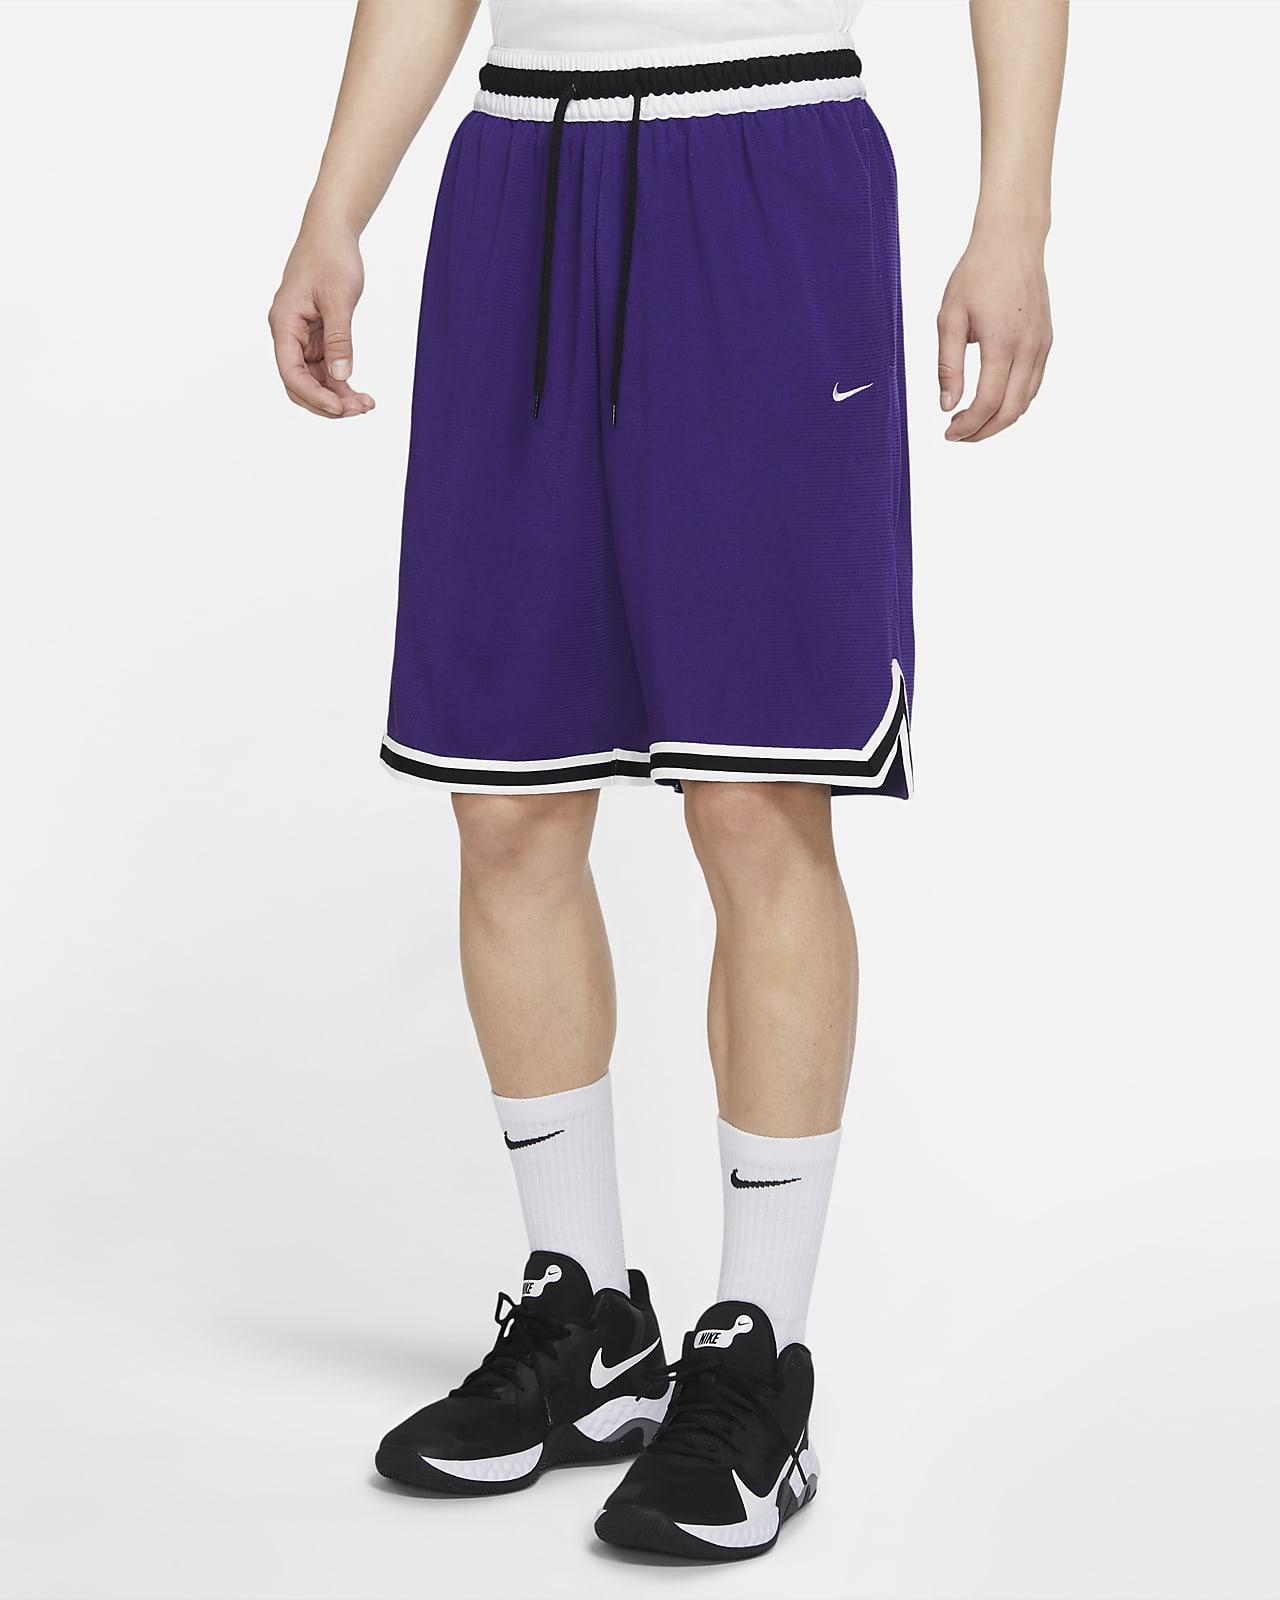 Nike Dri-FIT DNA 3.0 男款籃球褲